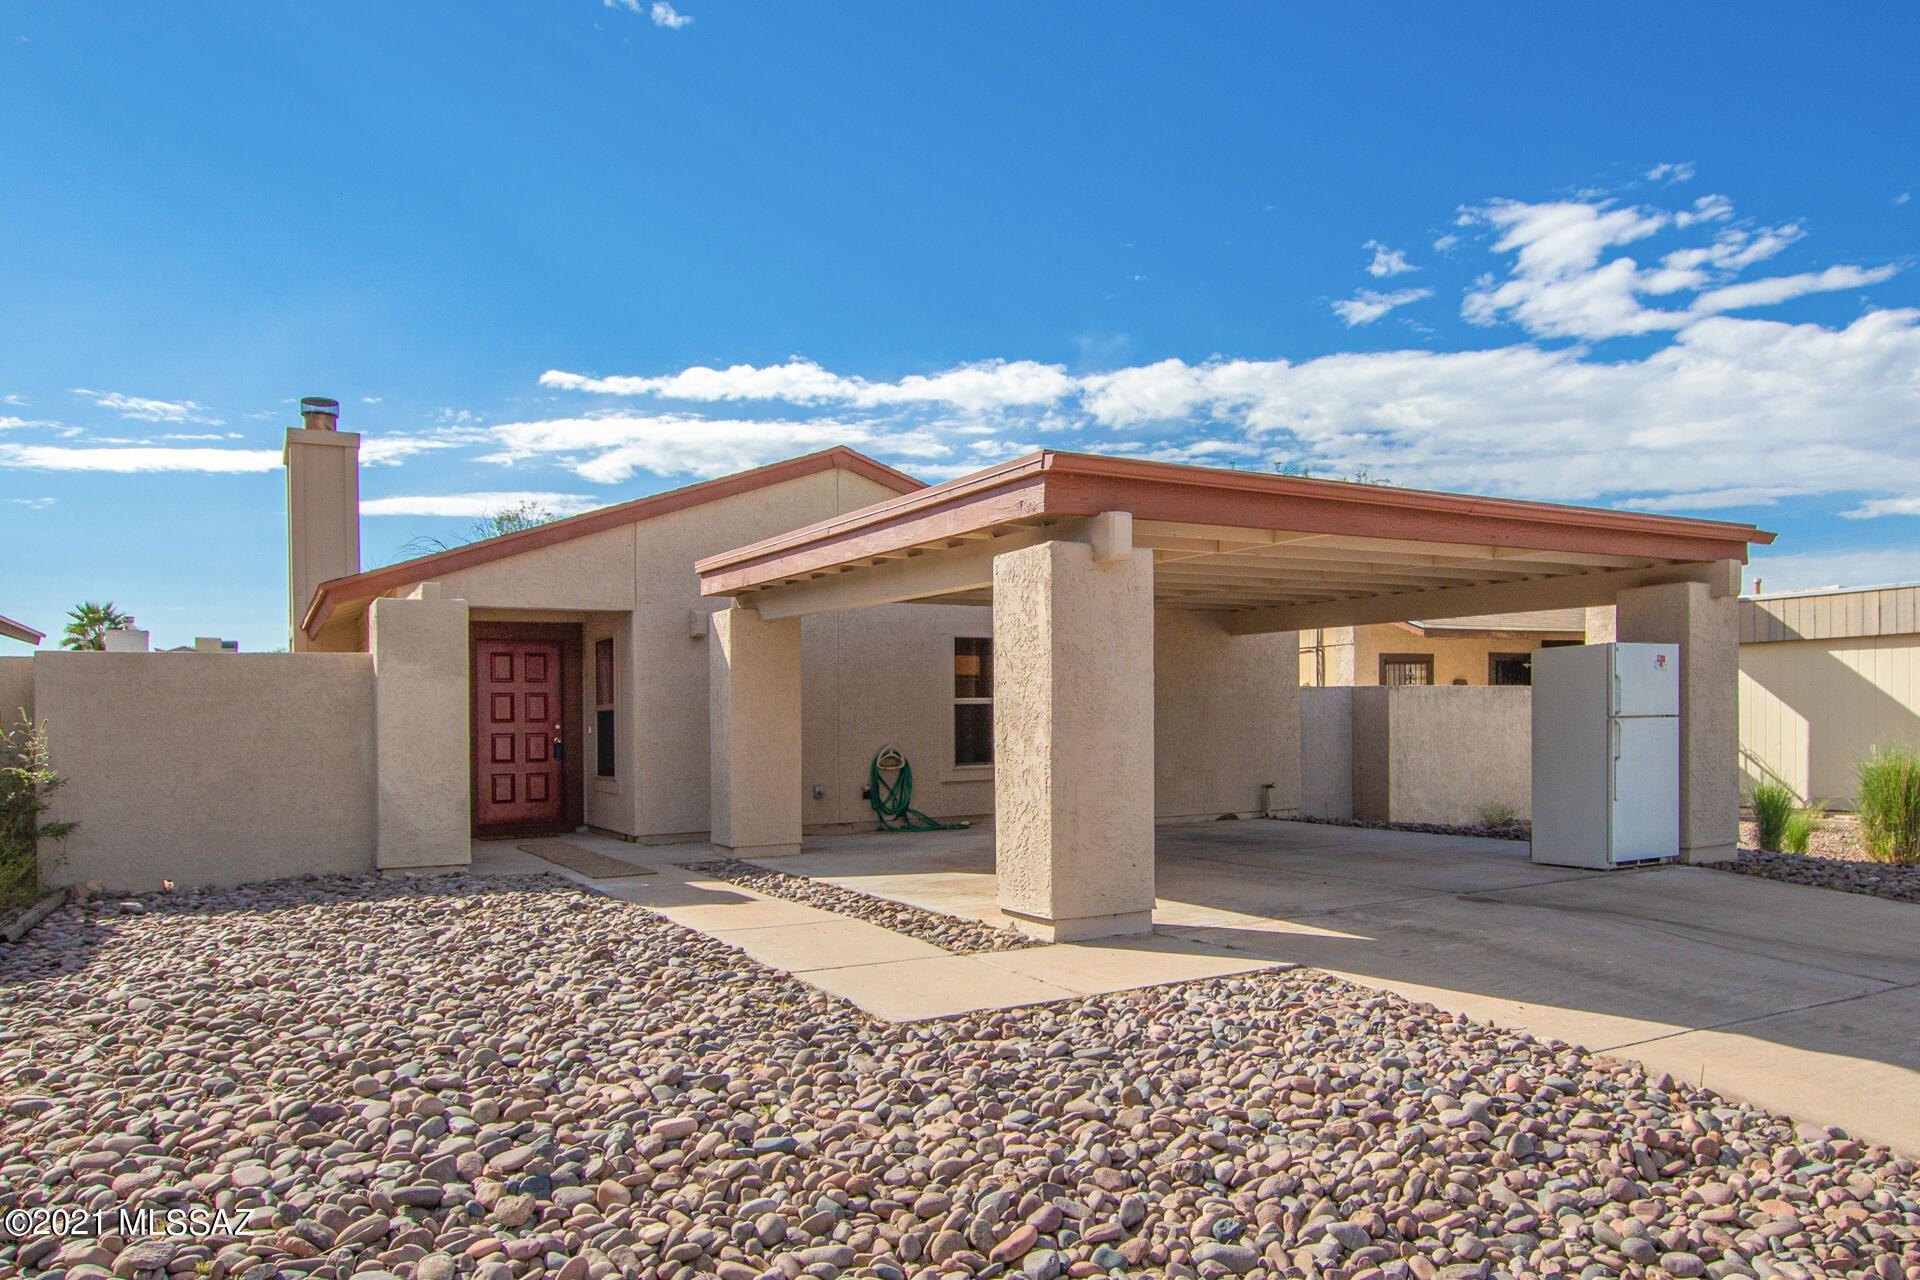 1021 N Independence Avenue, Tucson, AZ 85748 - MLS#: 22124752